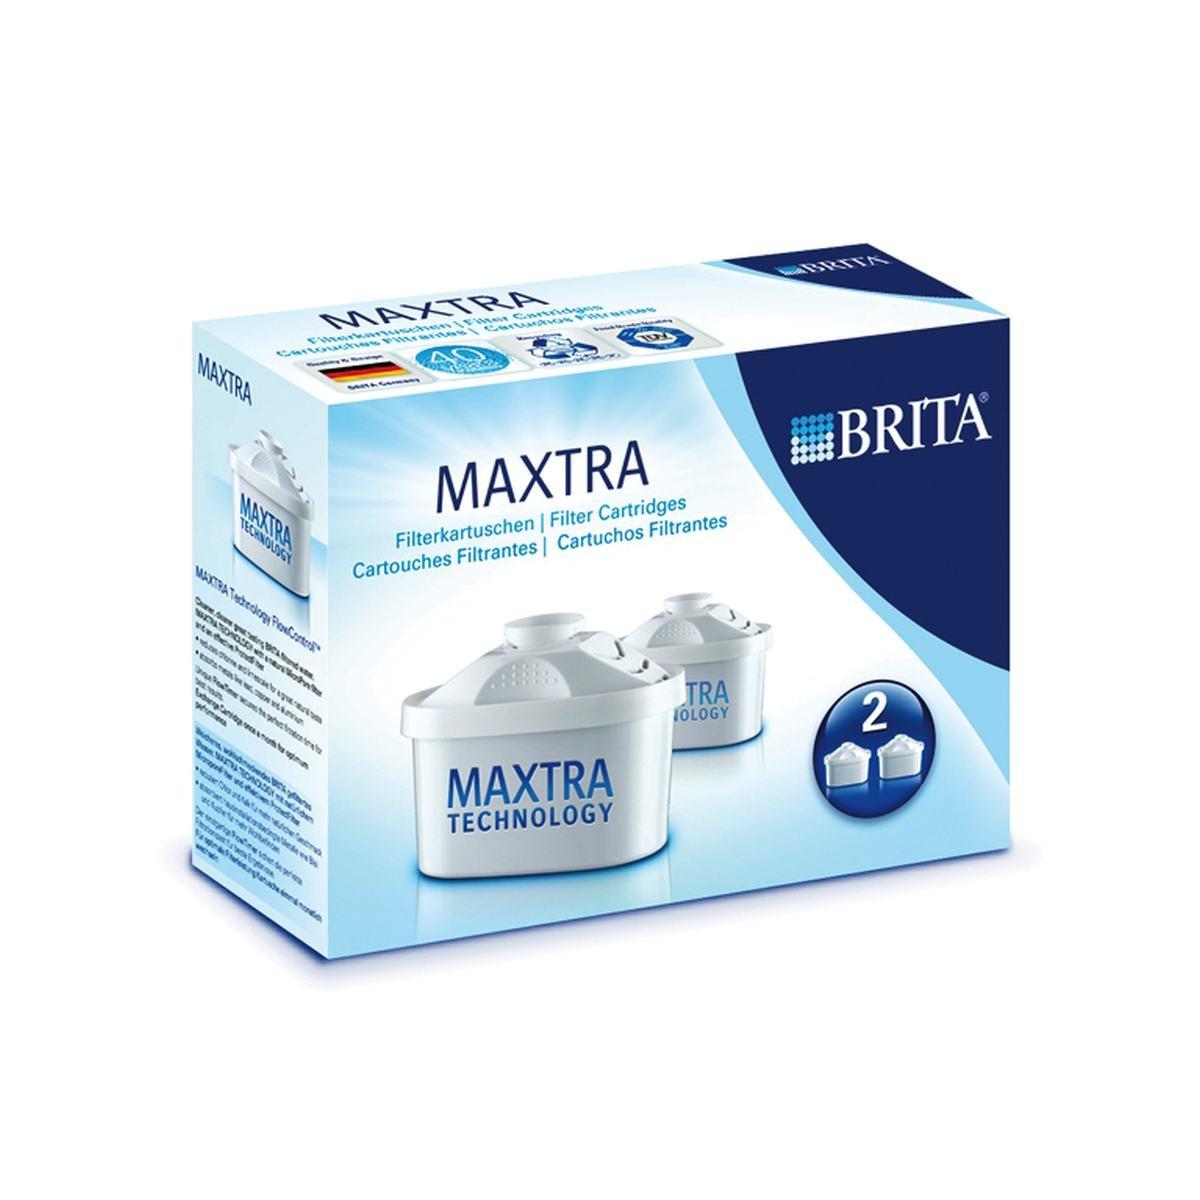 Vandfilterpatron Brita Maxtra 2 stk. - Brita